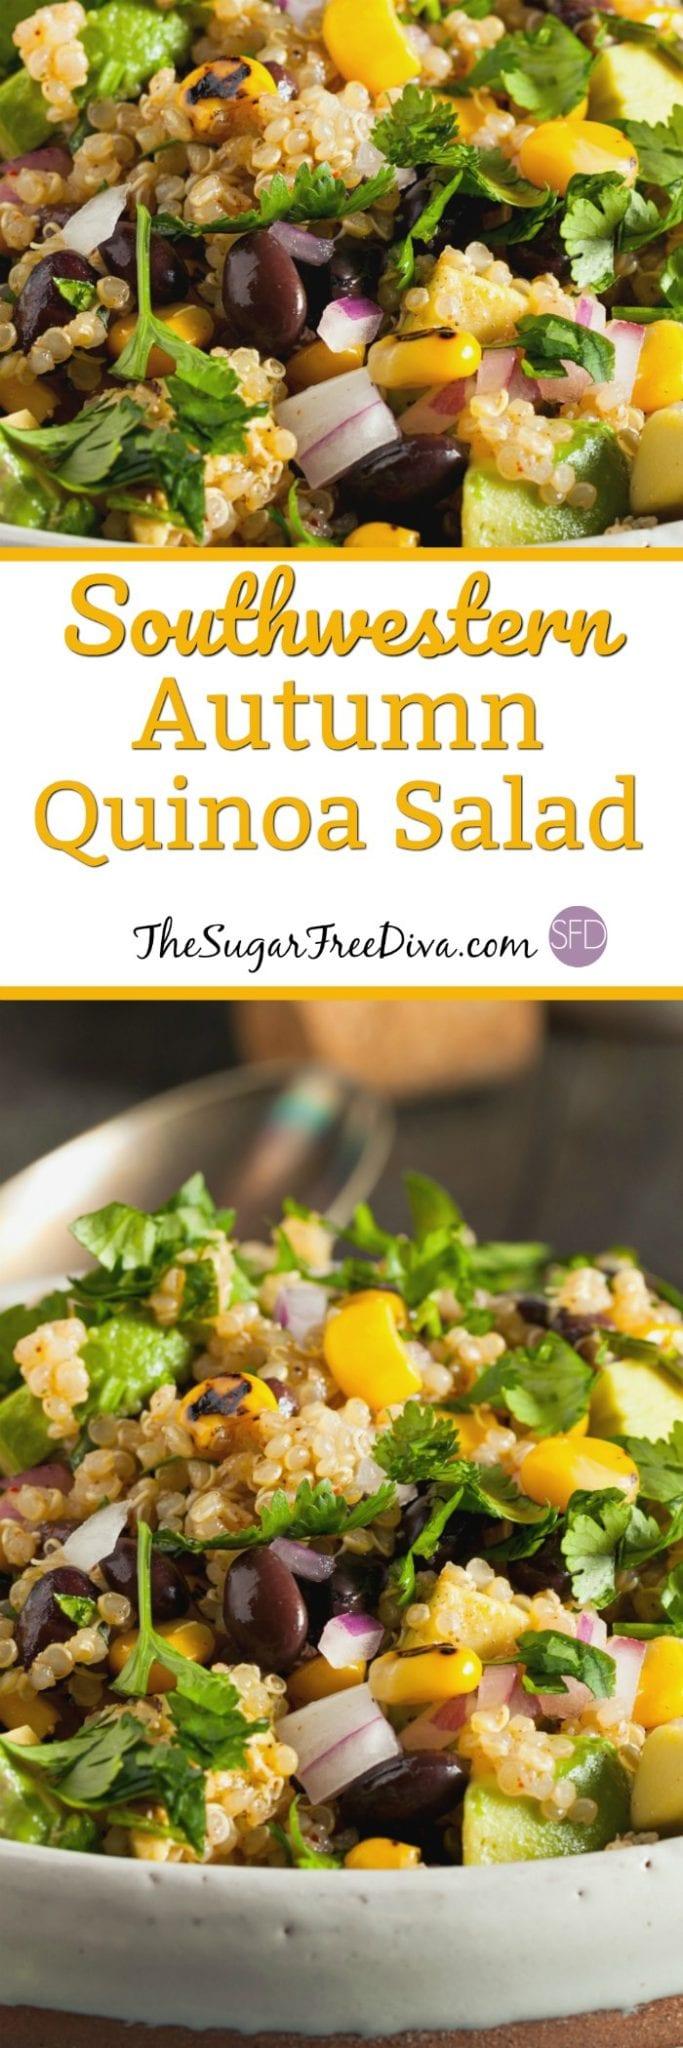 Southwestern Autumn Quinoa Salad